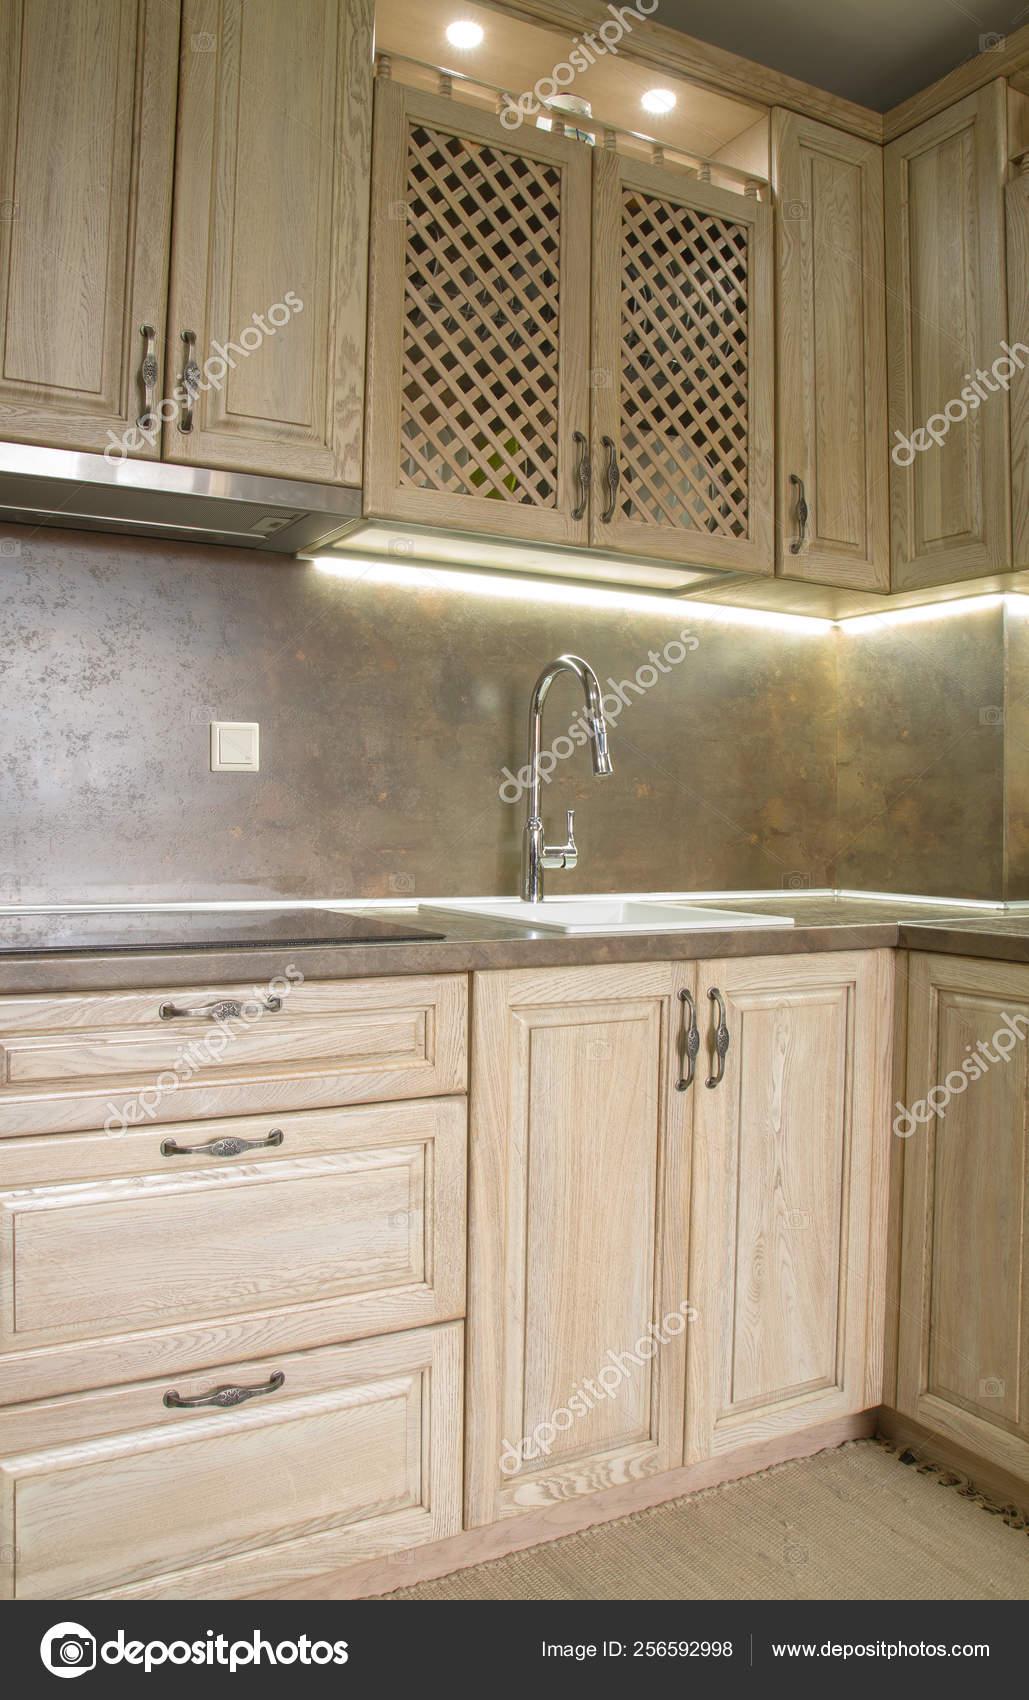 Vintage Style Kitchen Furniture Stock Photo C Kocetoilief 256592998